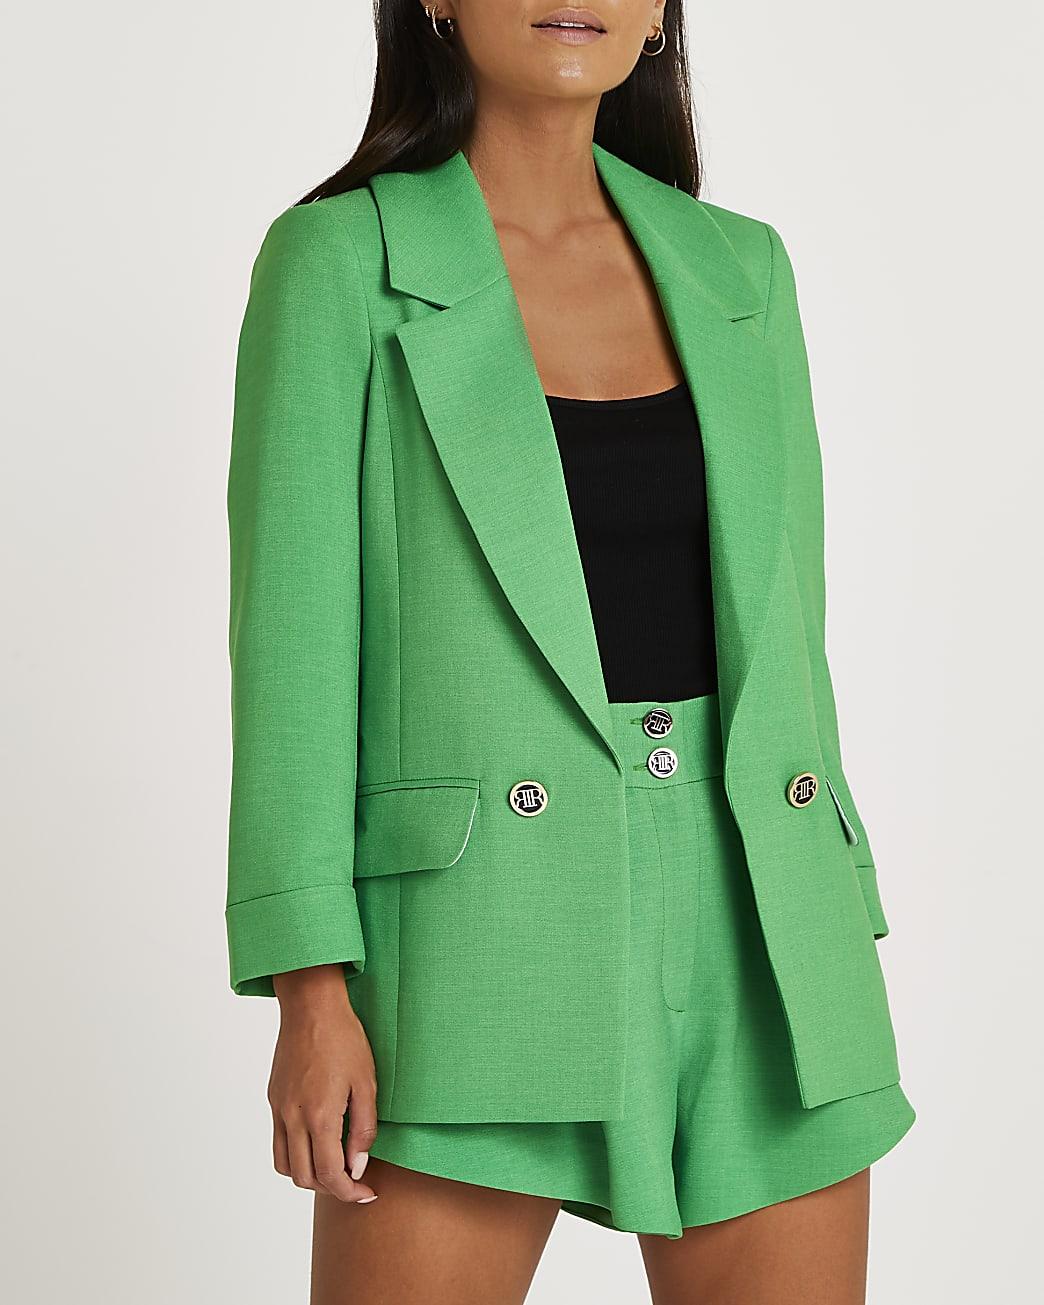 Petite green blazer